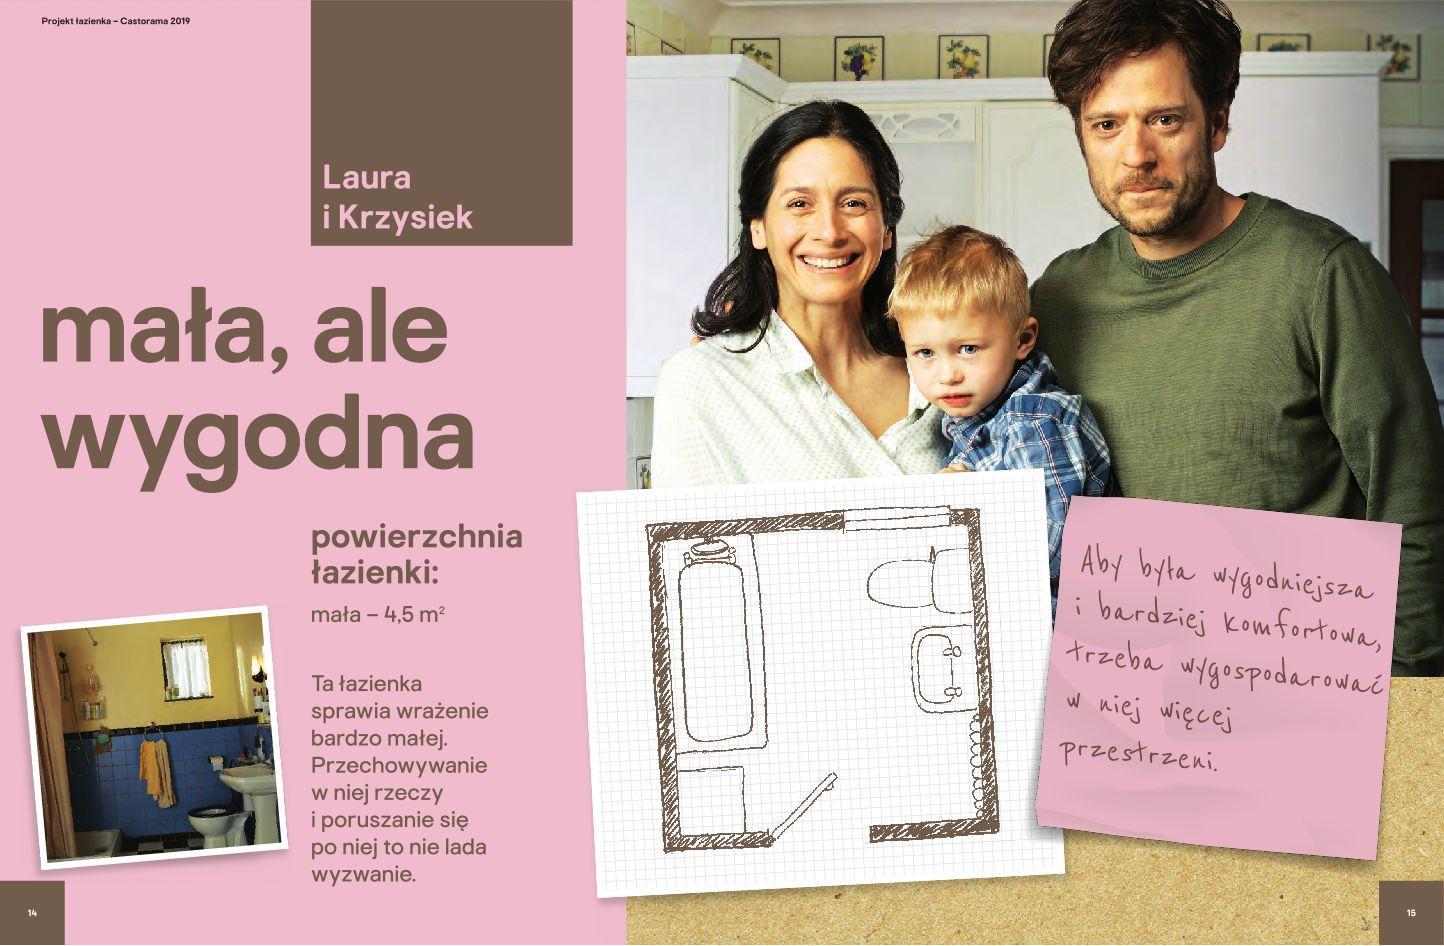 Gazetka promocyjna Castorama do 31/12/2019 str.8